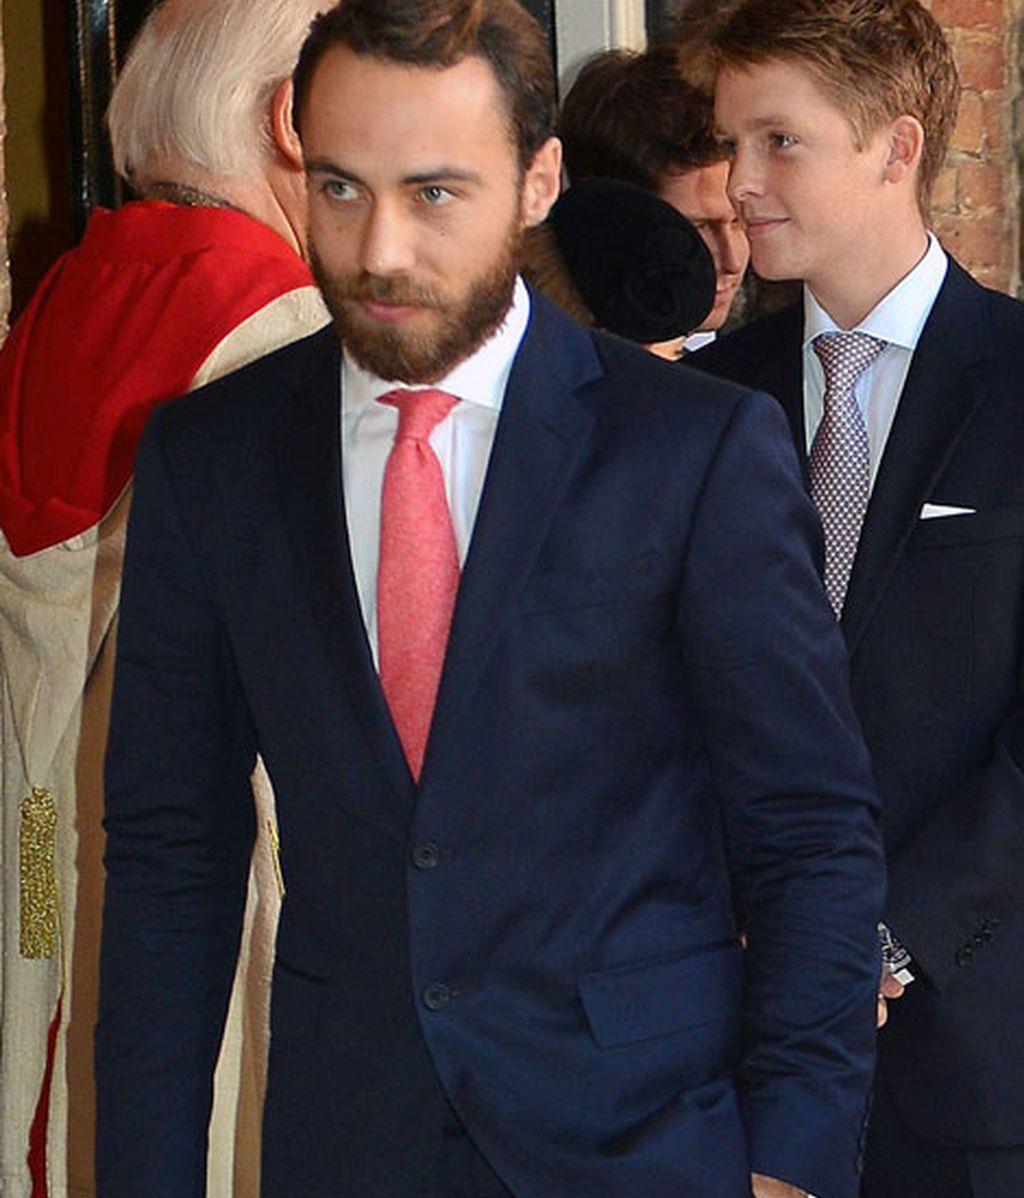 James Middleton, hermano de Kate, con una corbata coral